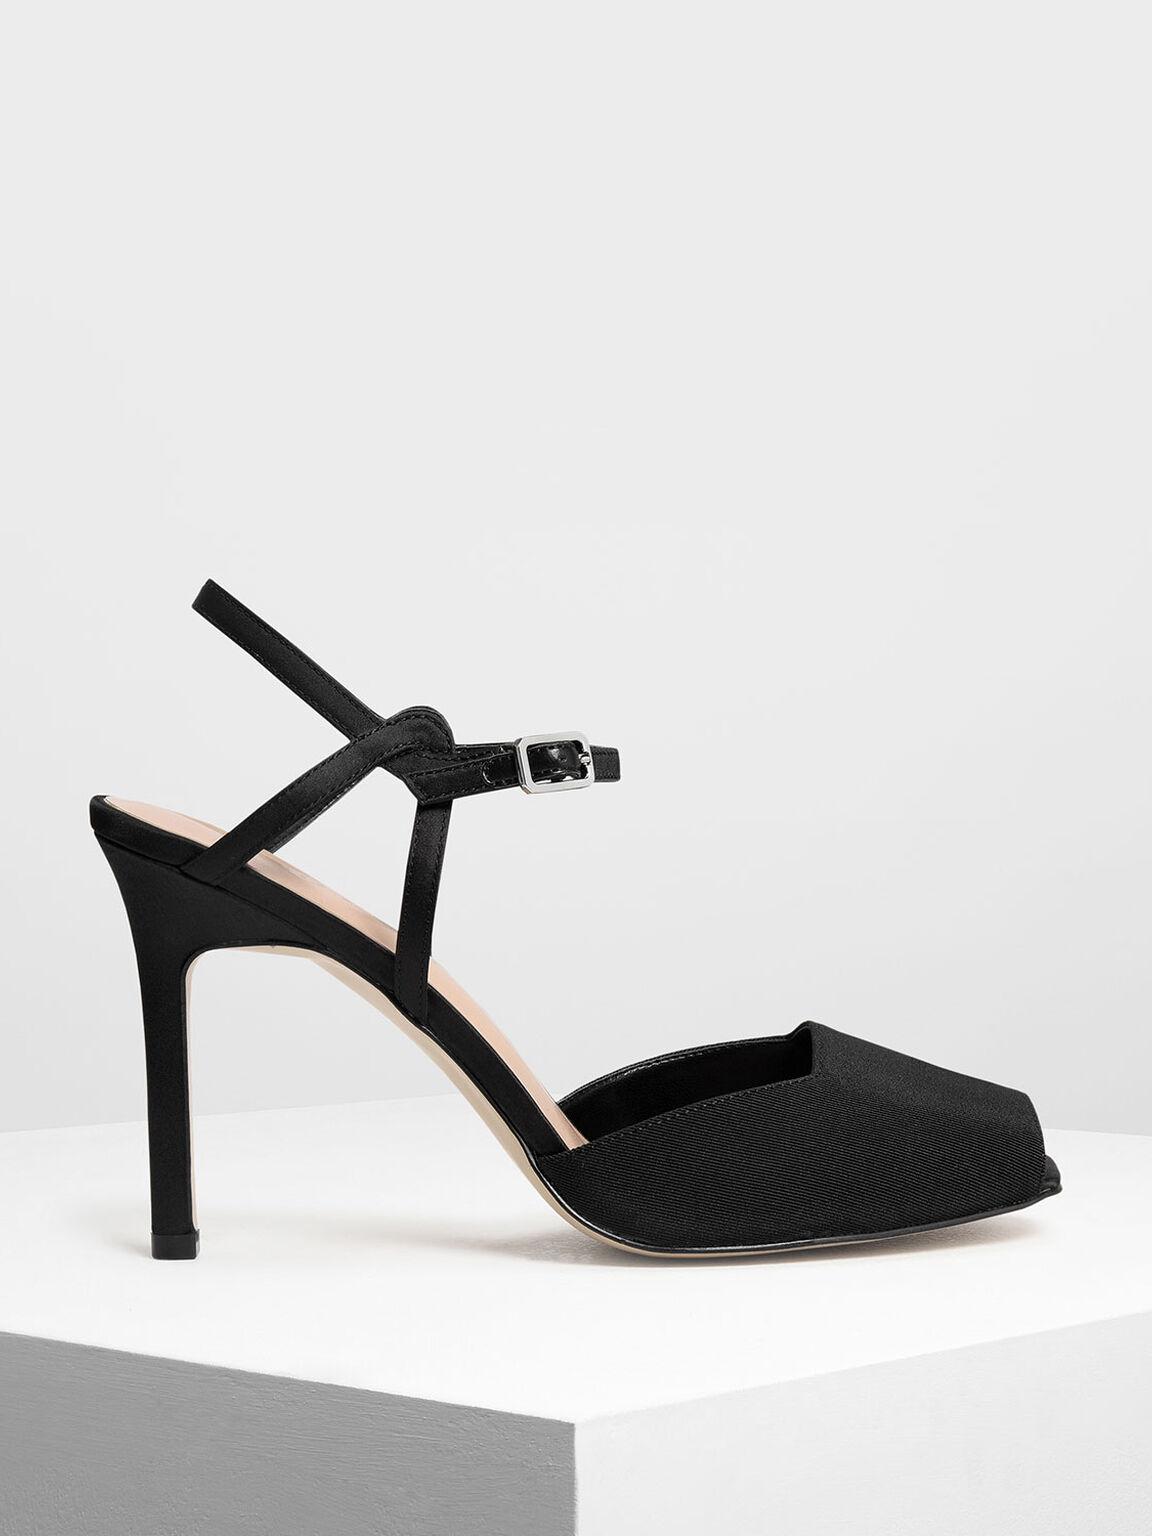 Peep Toe Satin Heeled Sandals, Black, hi-res